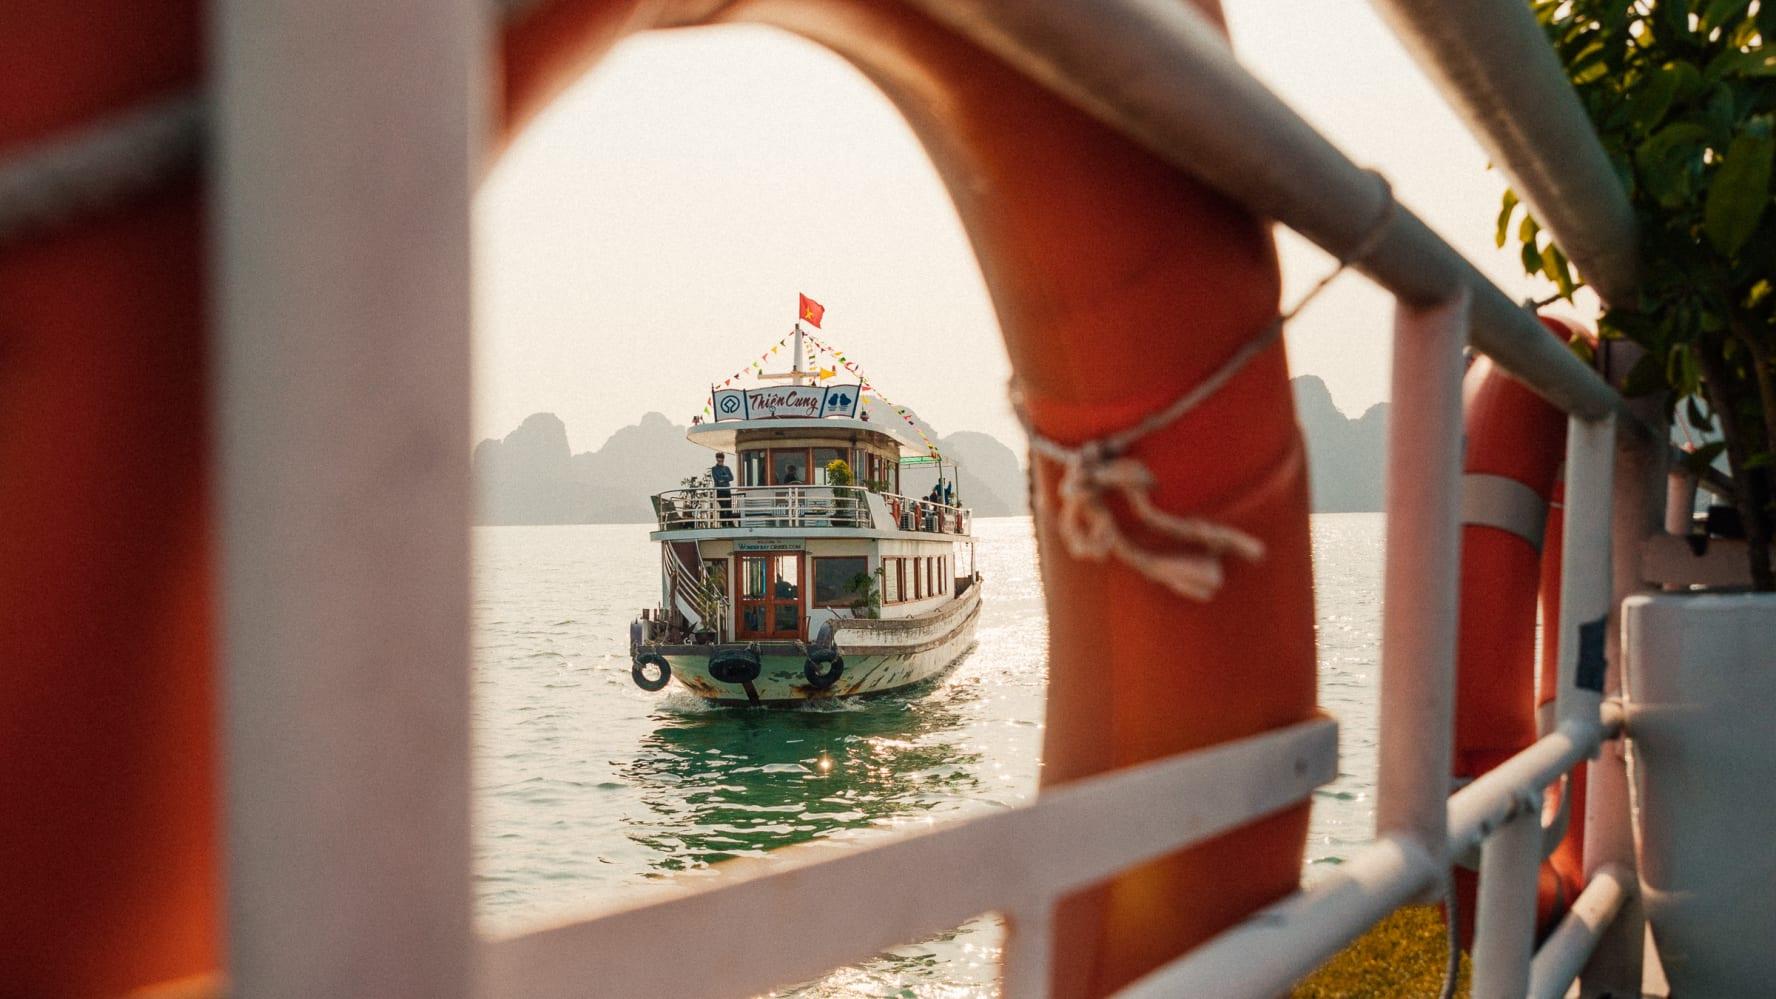 Hanoi Tours - Private Tours in Hanoi - Withlocals